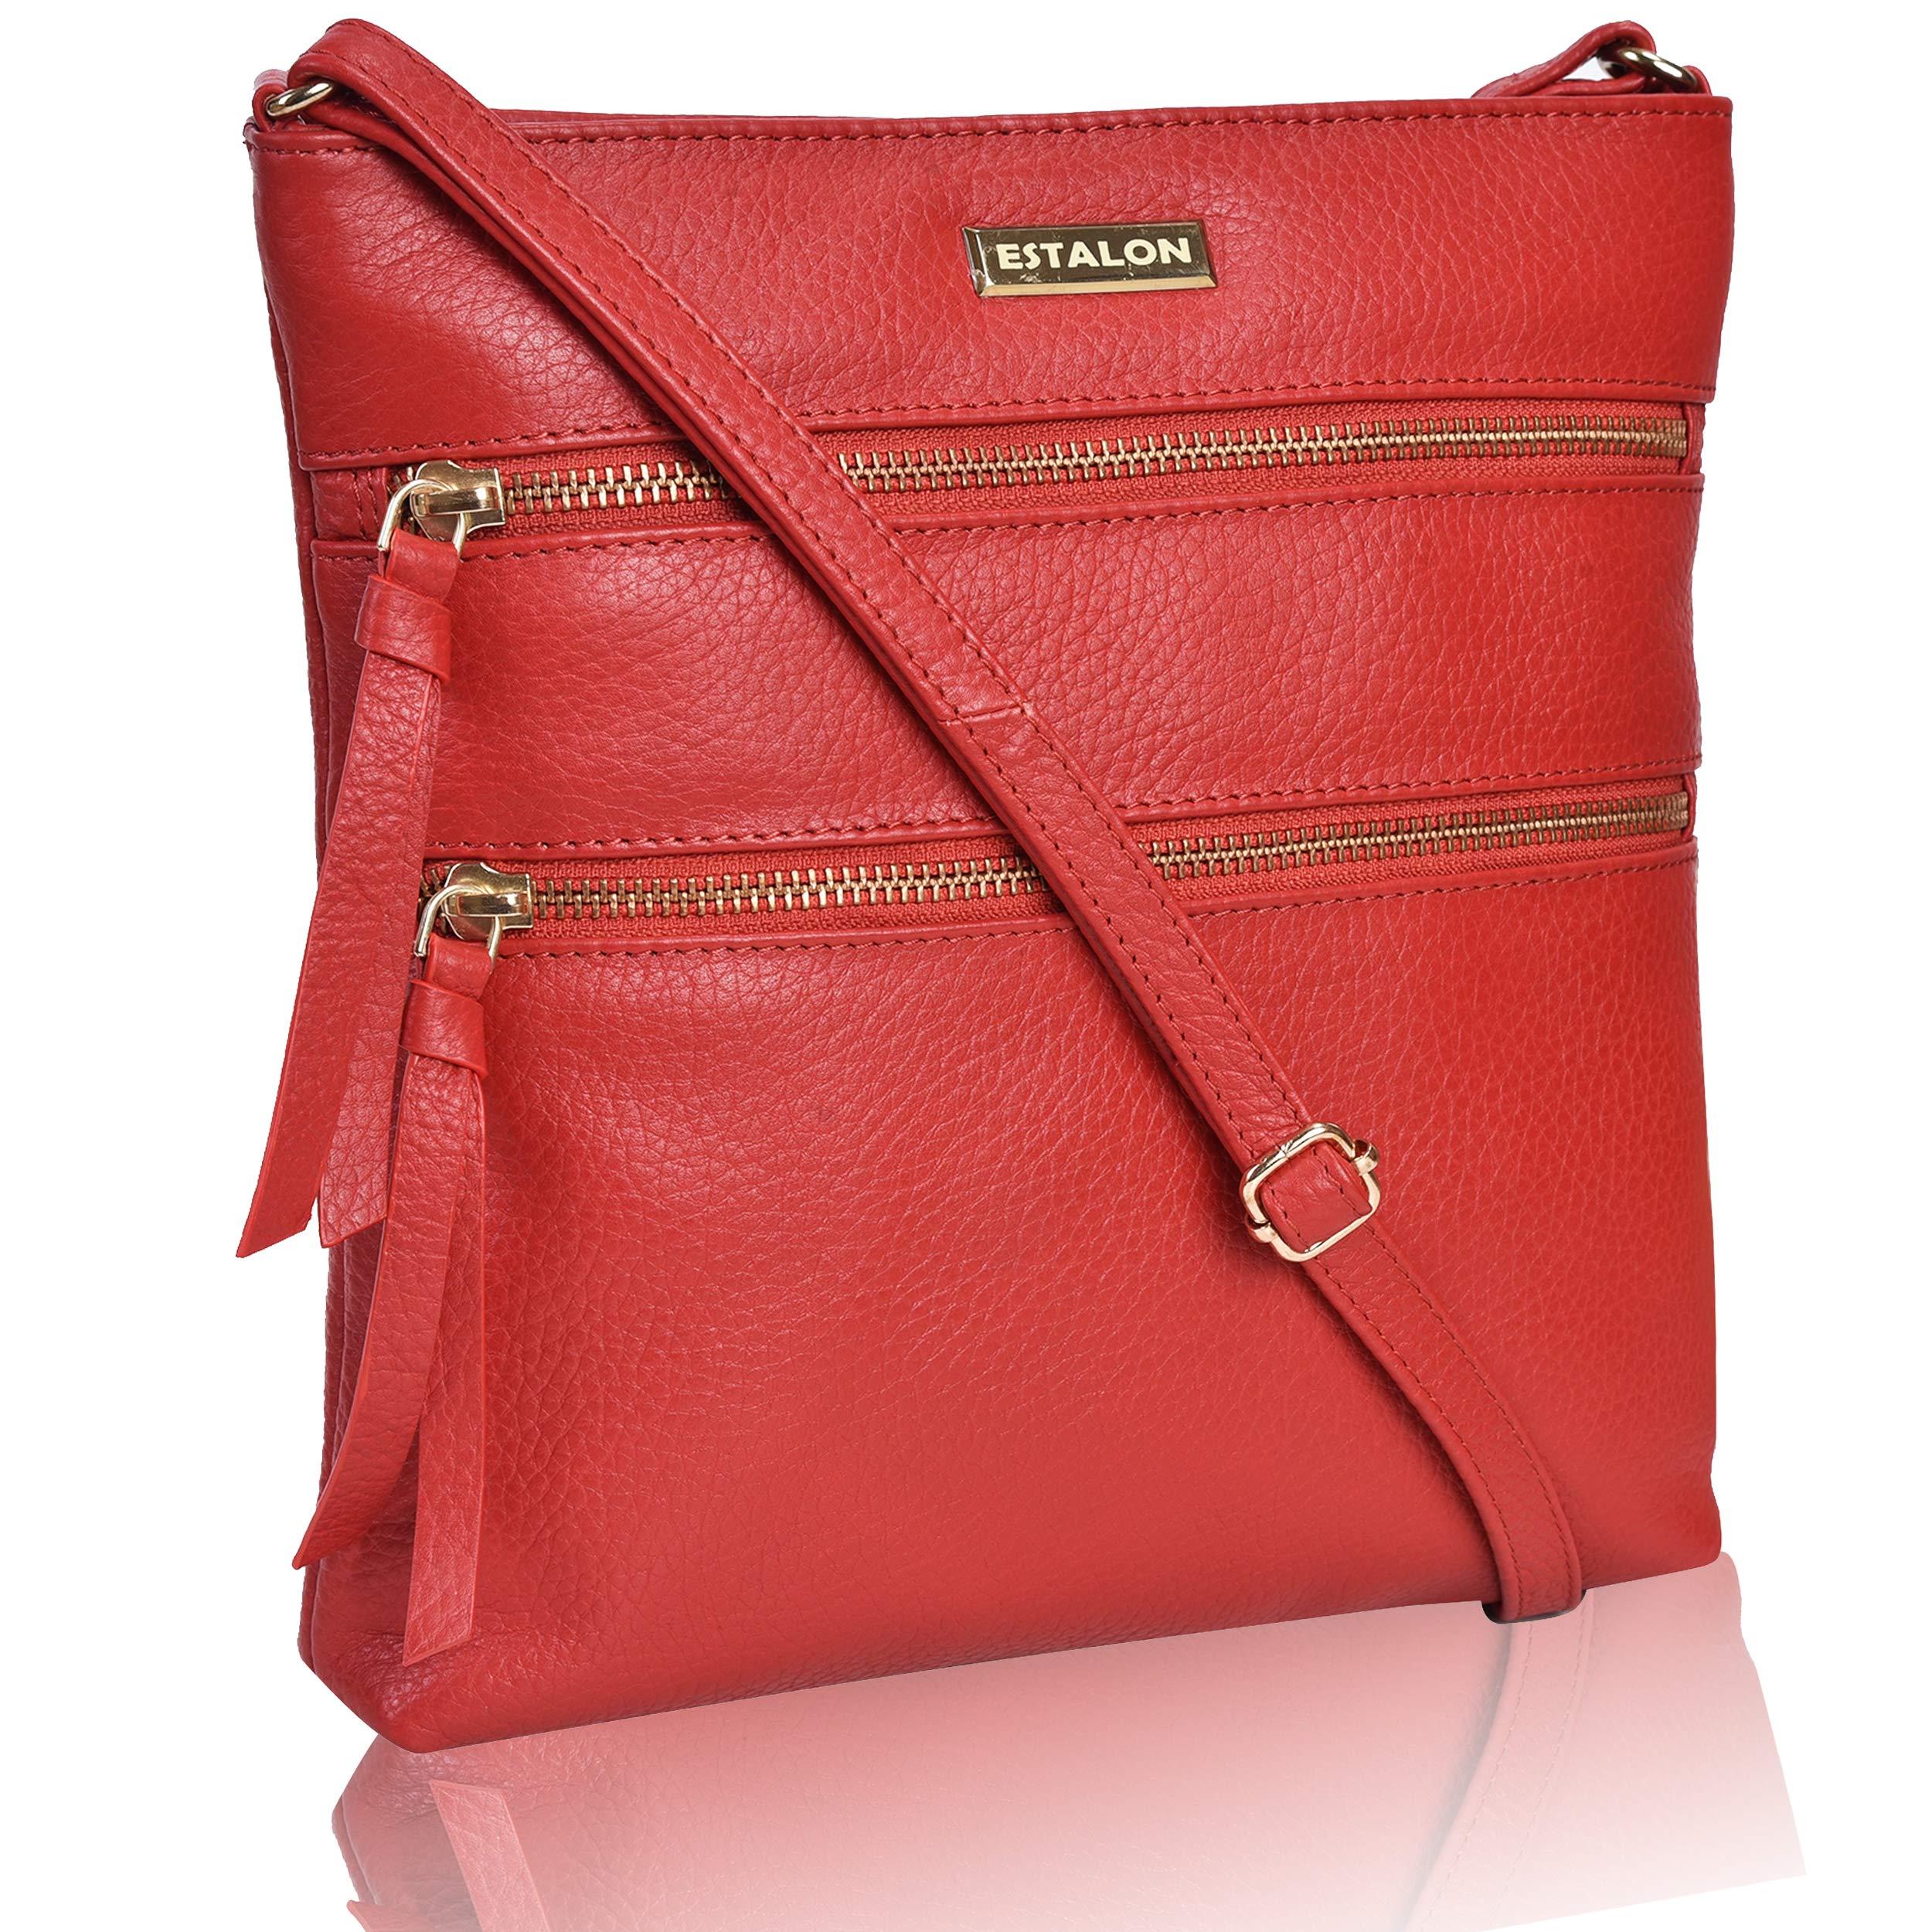 EASTER GIFT Hand Made Light Weight Small Genuine Leather Crossbody Bag Cross Over Purse Messenger Bags for Women Cross Body Shoulder Handbag (Red Pebble)